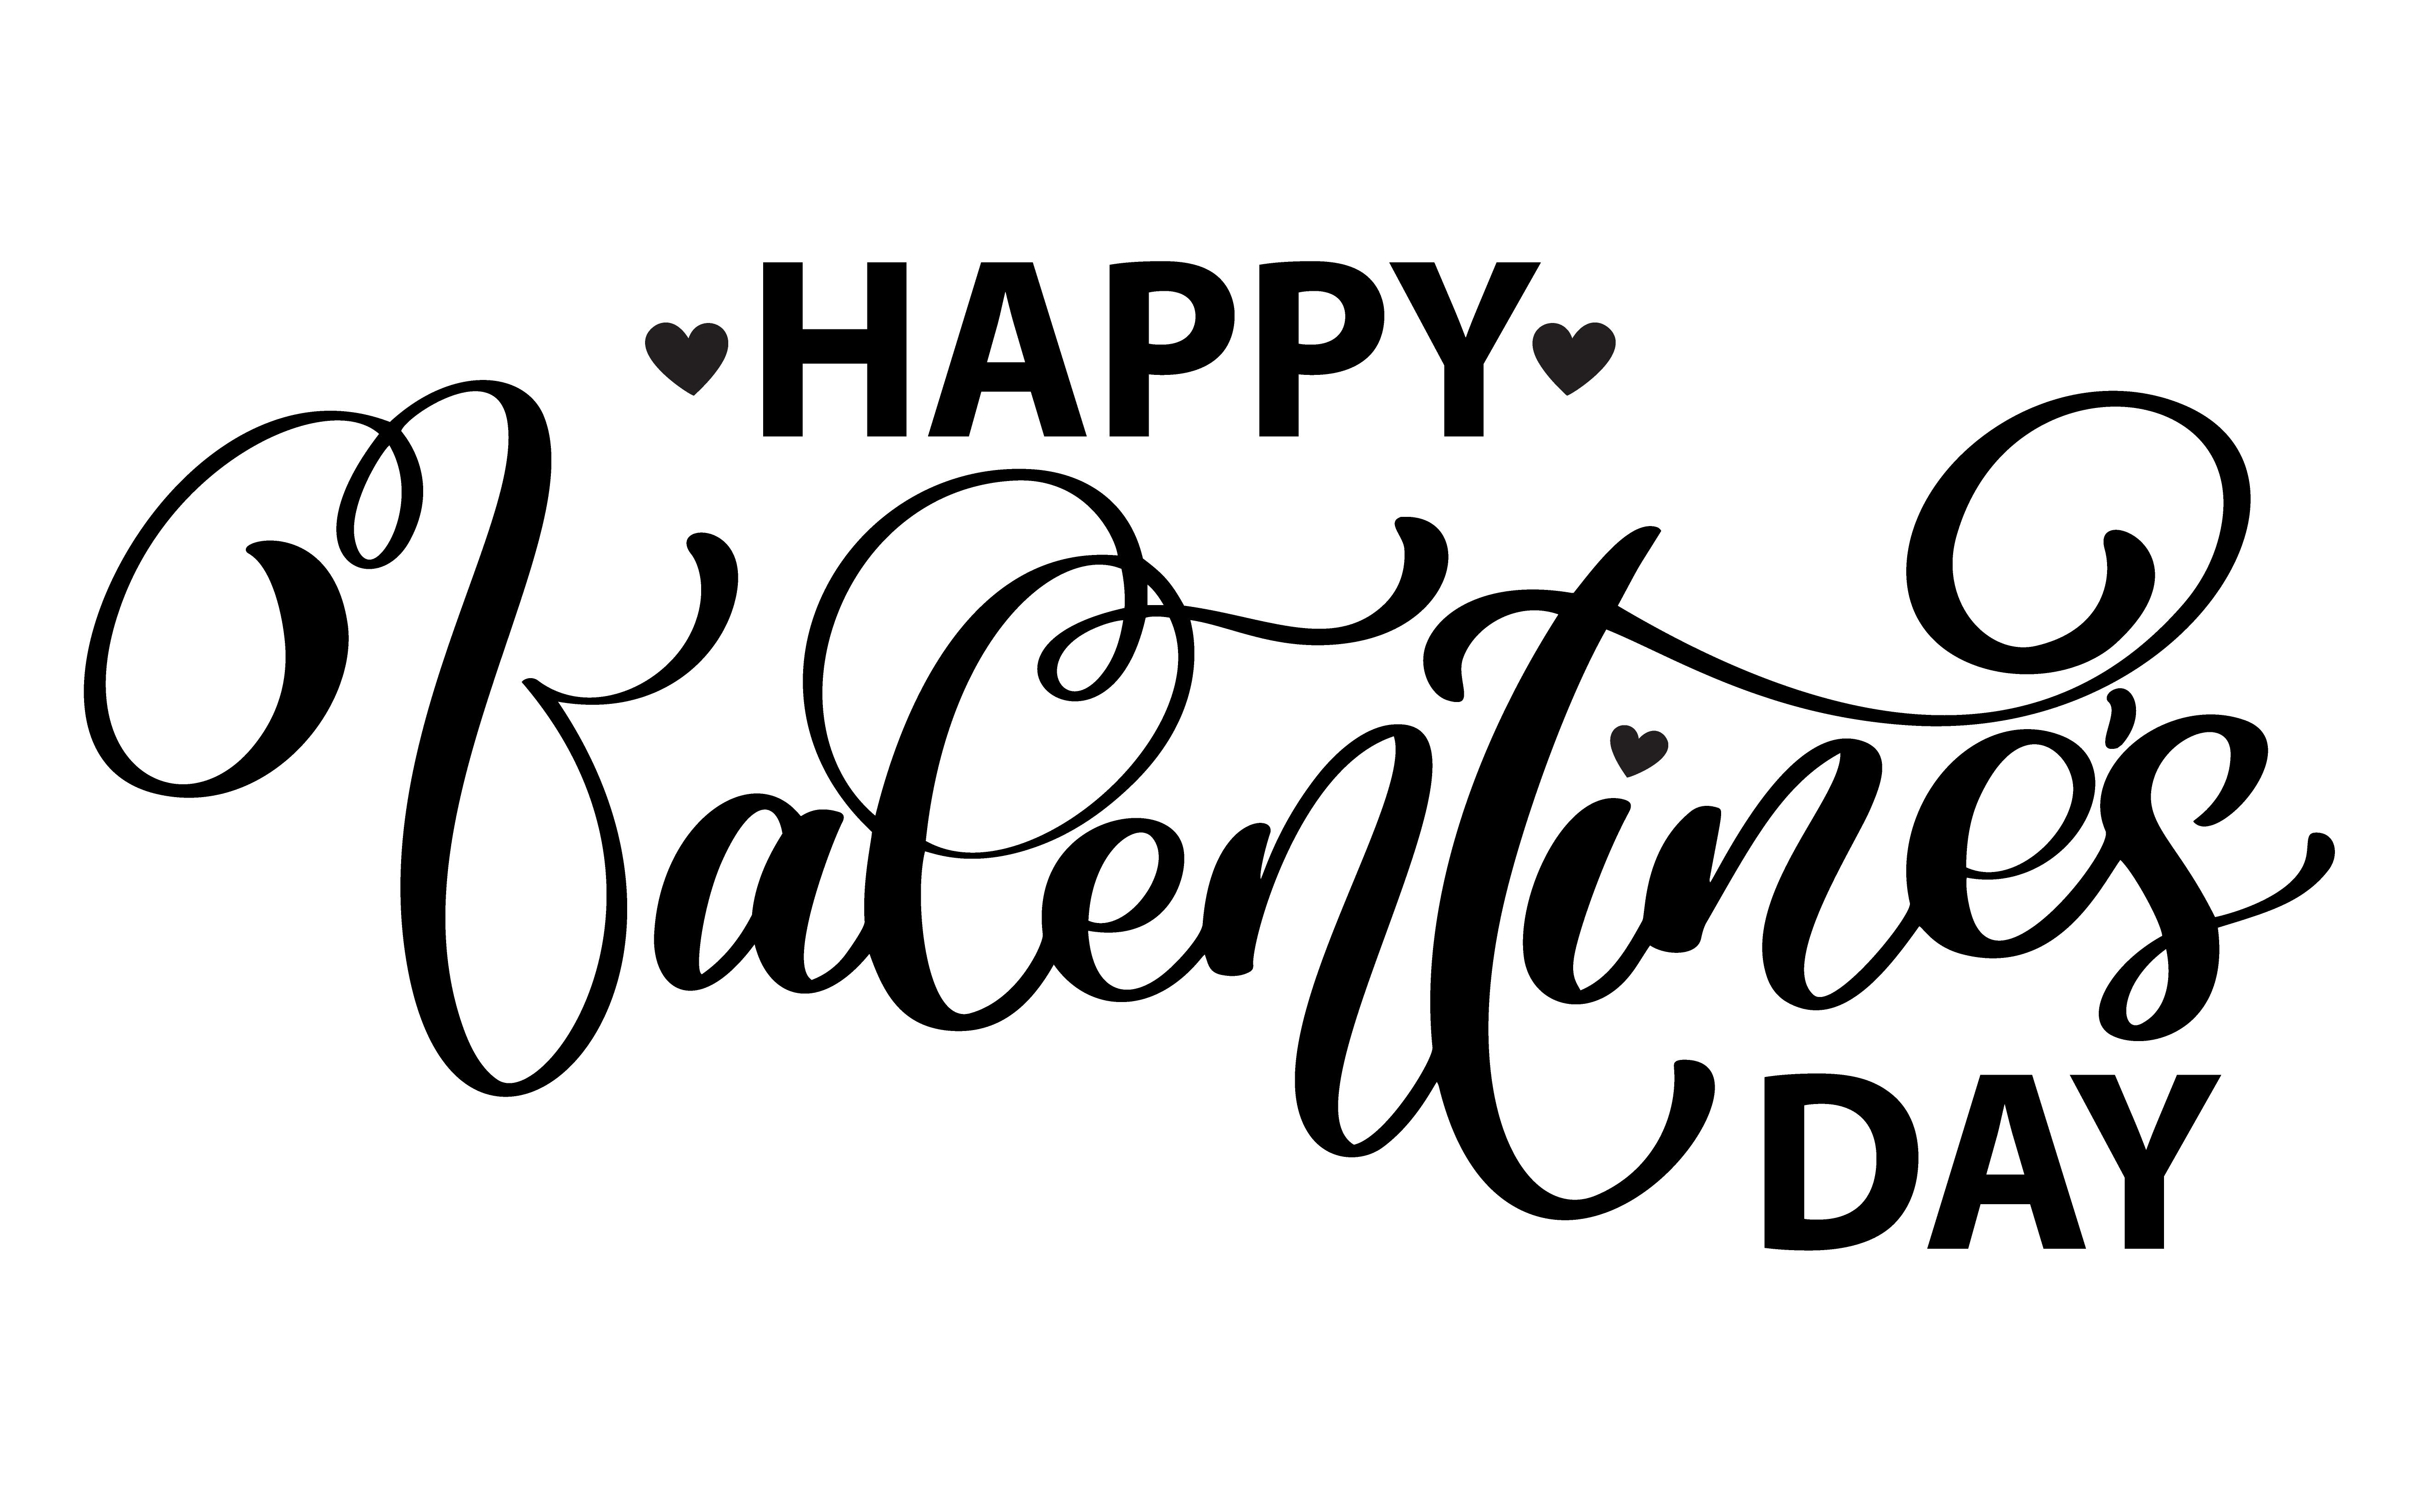 Cartel De Tipografia De Feliz Dia De San Valentin